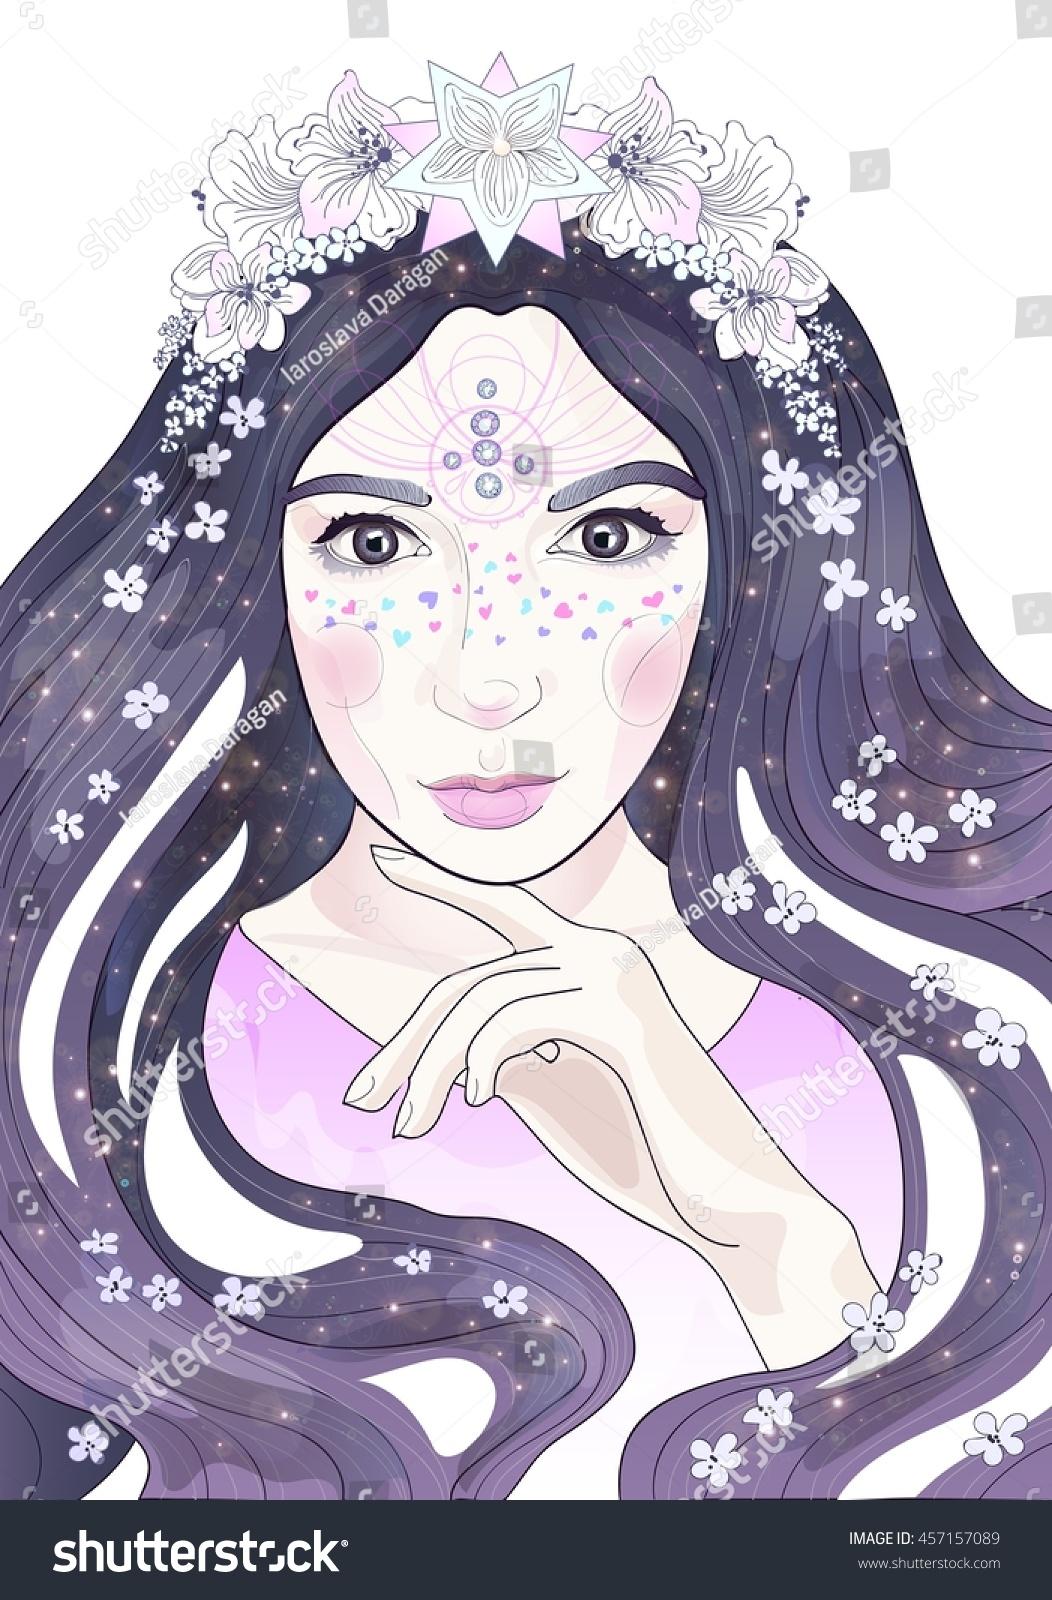 beautiful anime girl flowers stars long stock illustration 457157089